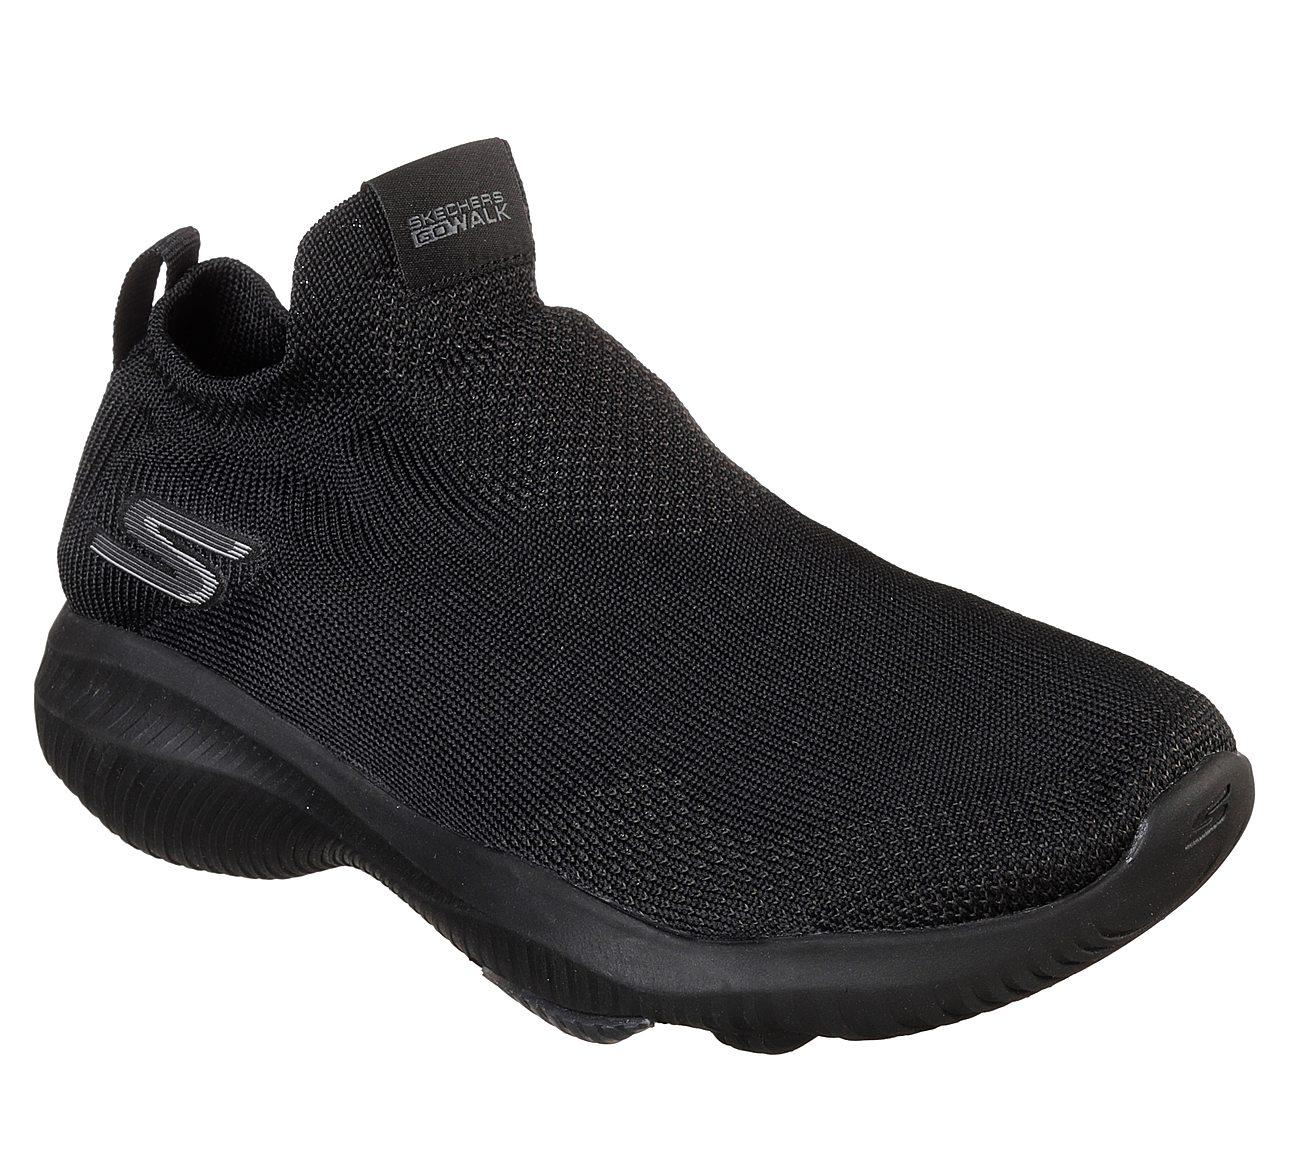 Skechers GOwalk Revolution Ultra - Jolt